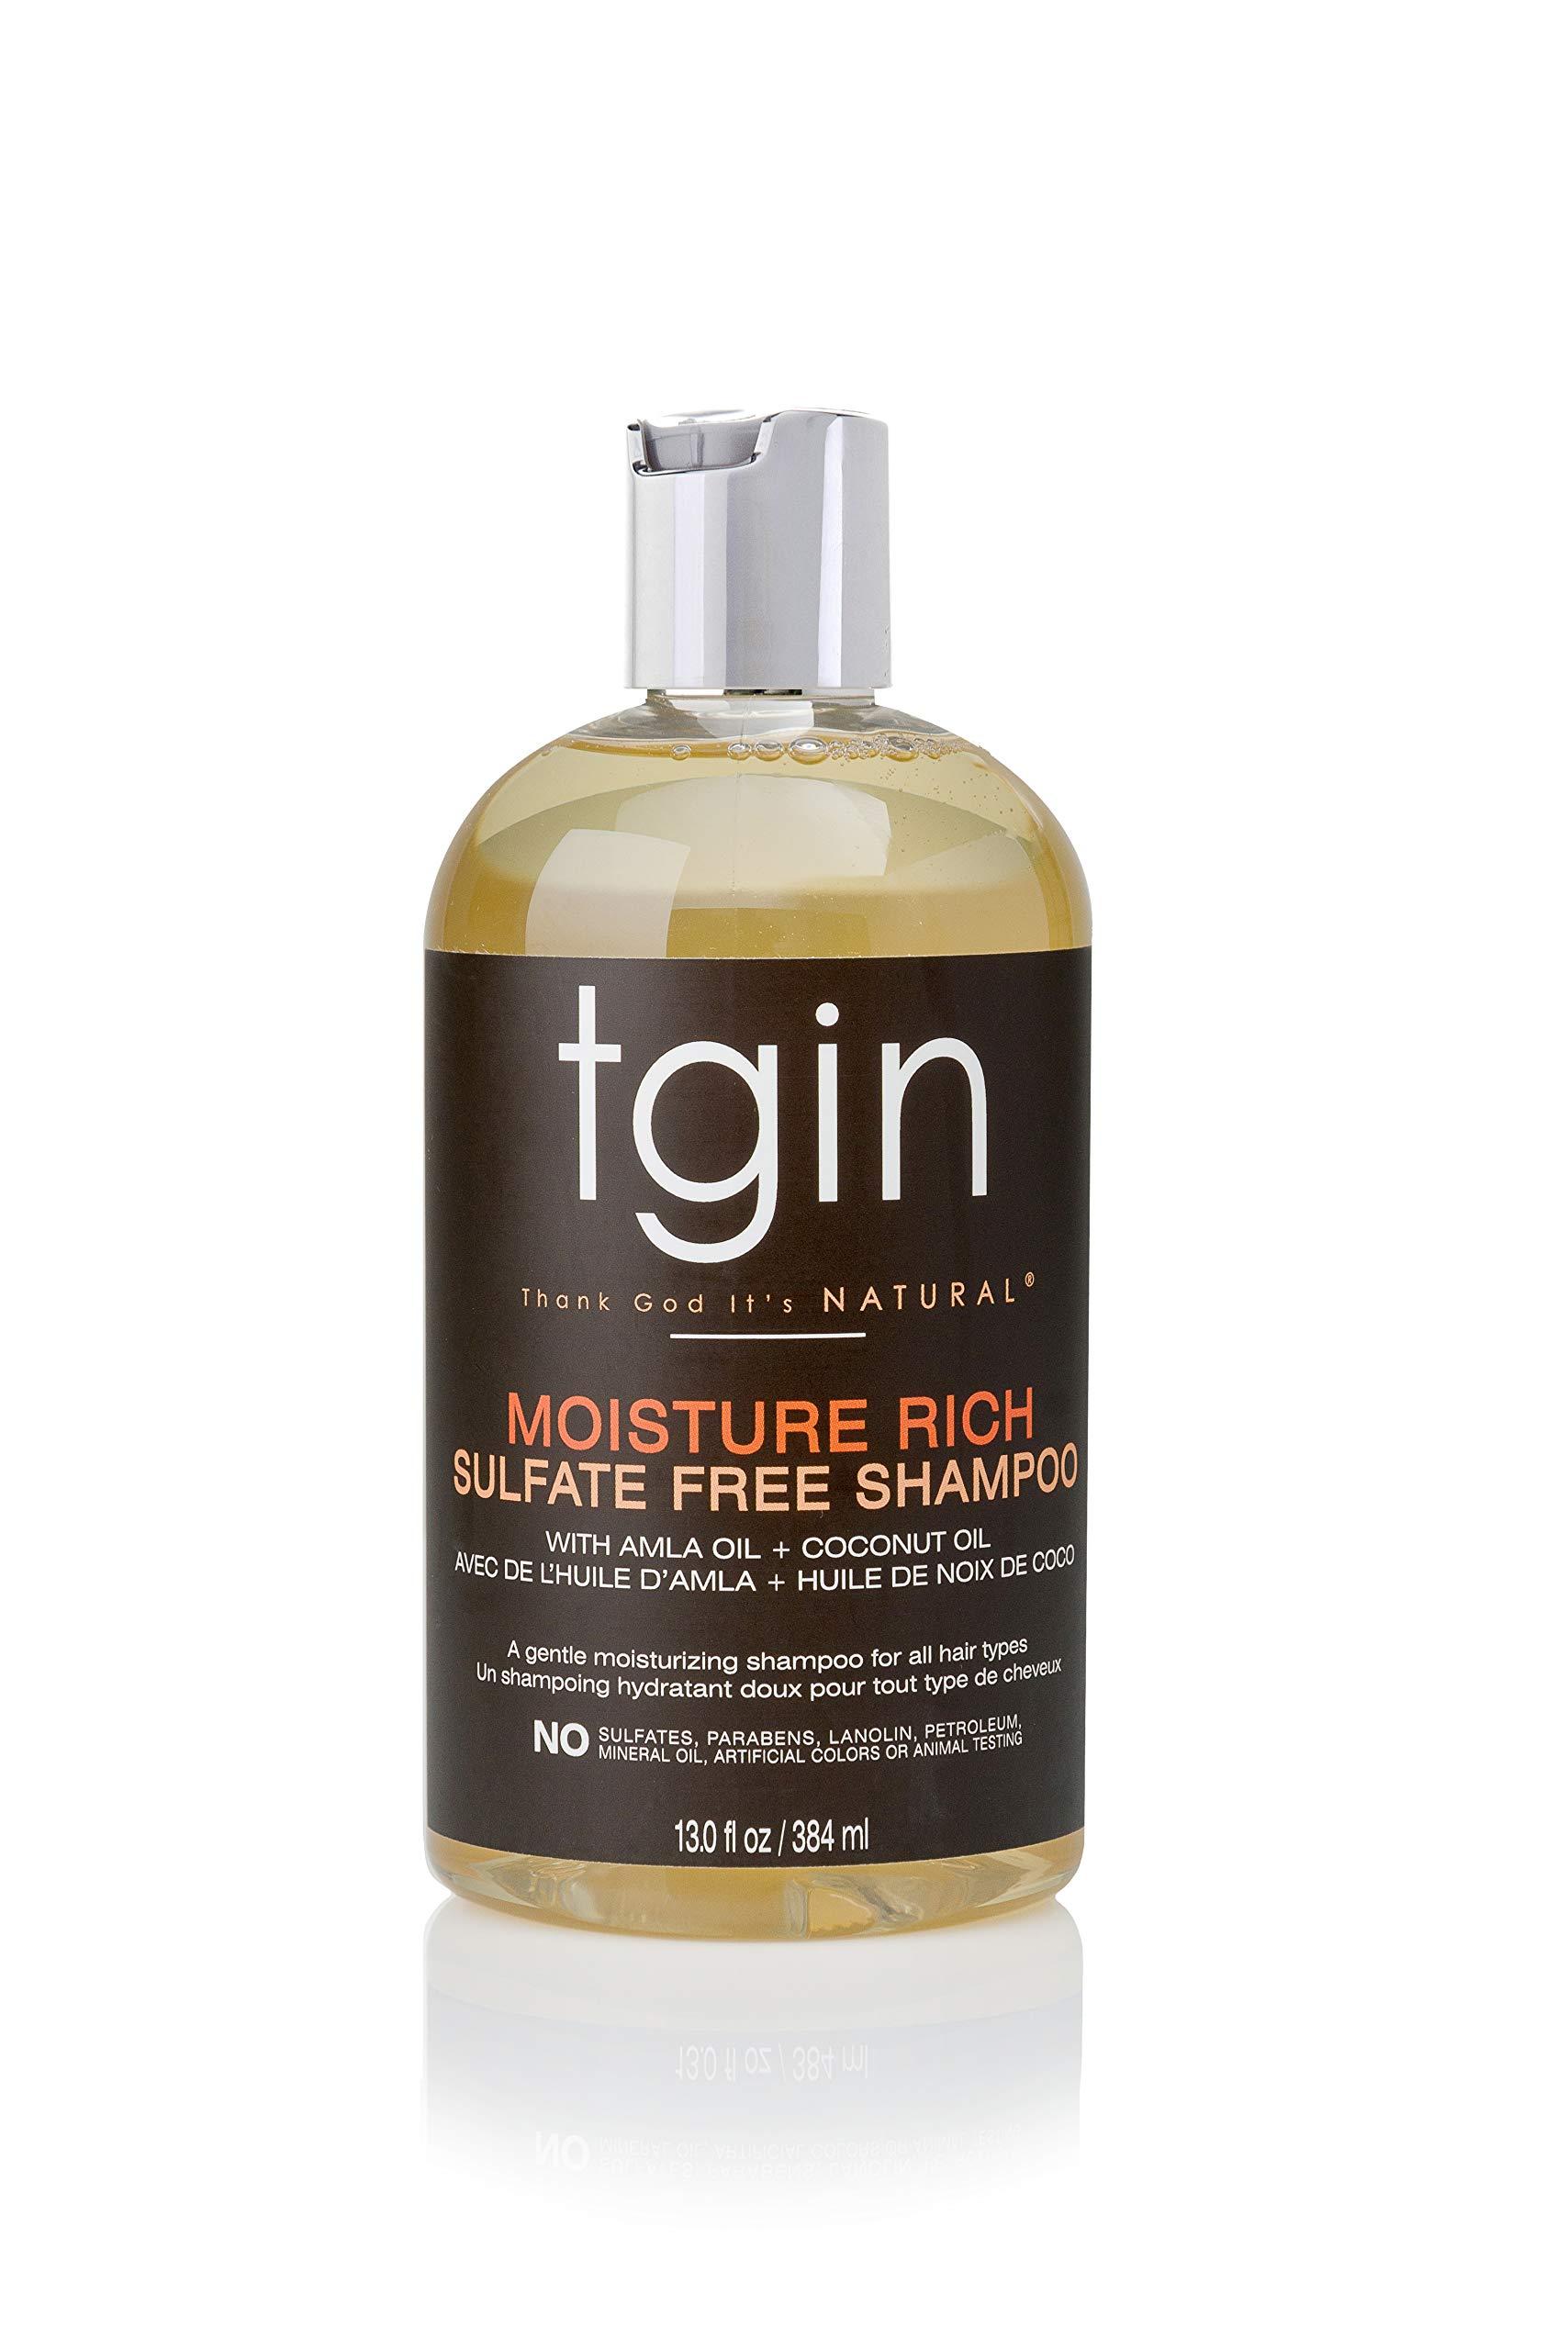 TGIN Thank God It's Natural Moisture Rich Sulfate Free Shampoo With Amla Oil + Coconut Oil 13 Fl oz